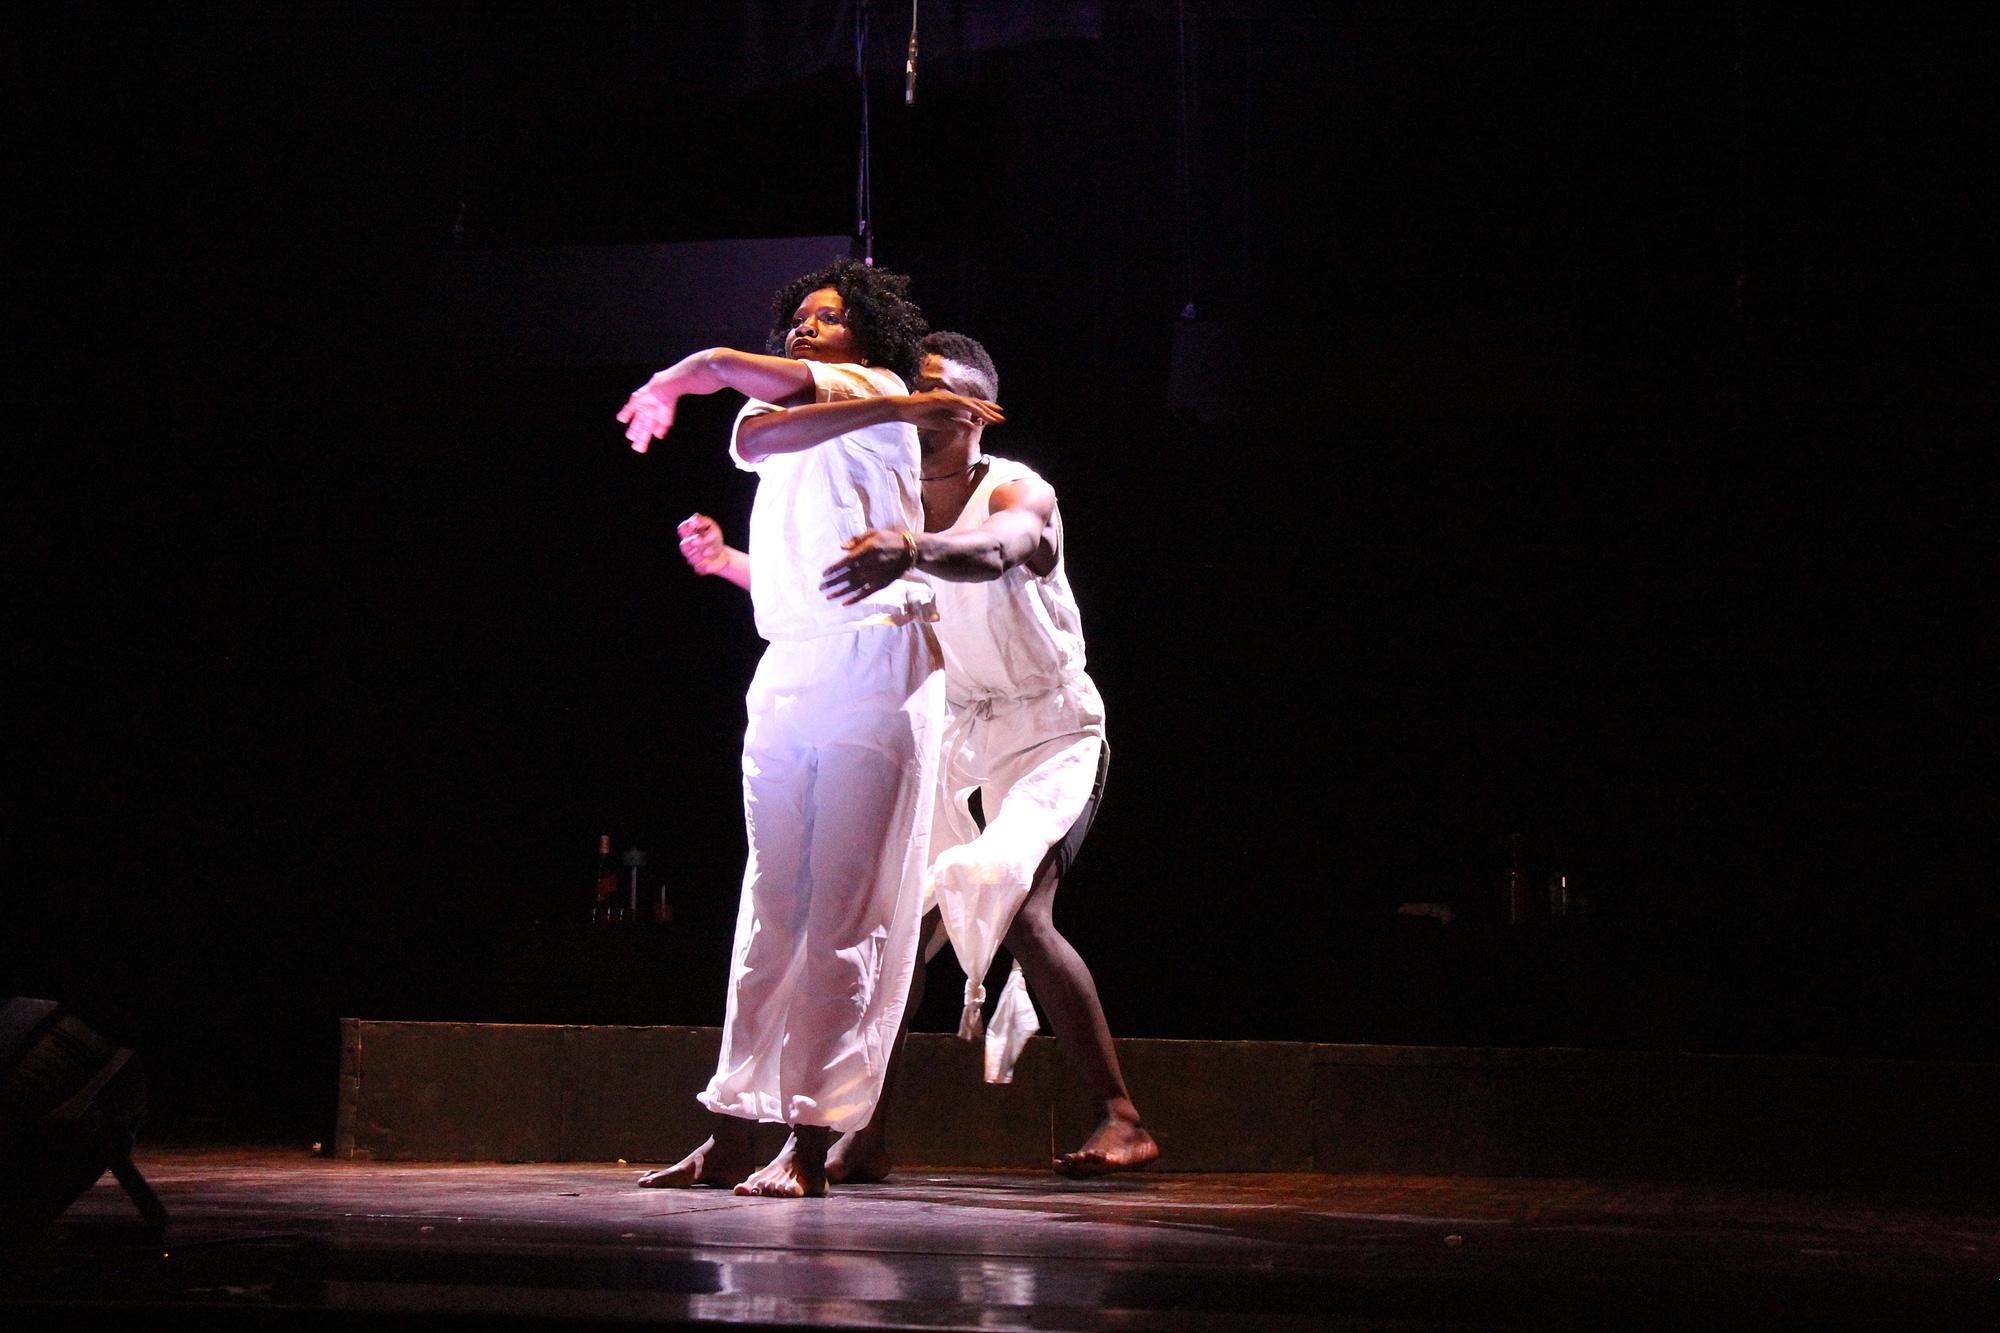 The contemporary dance routine